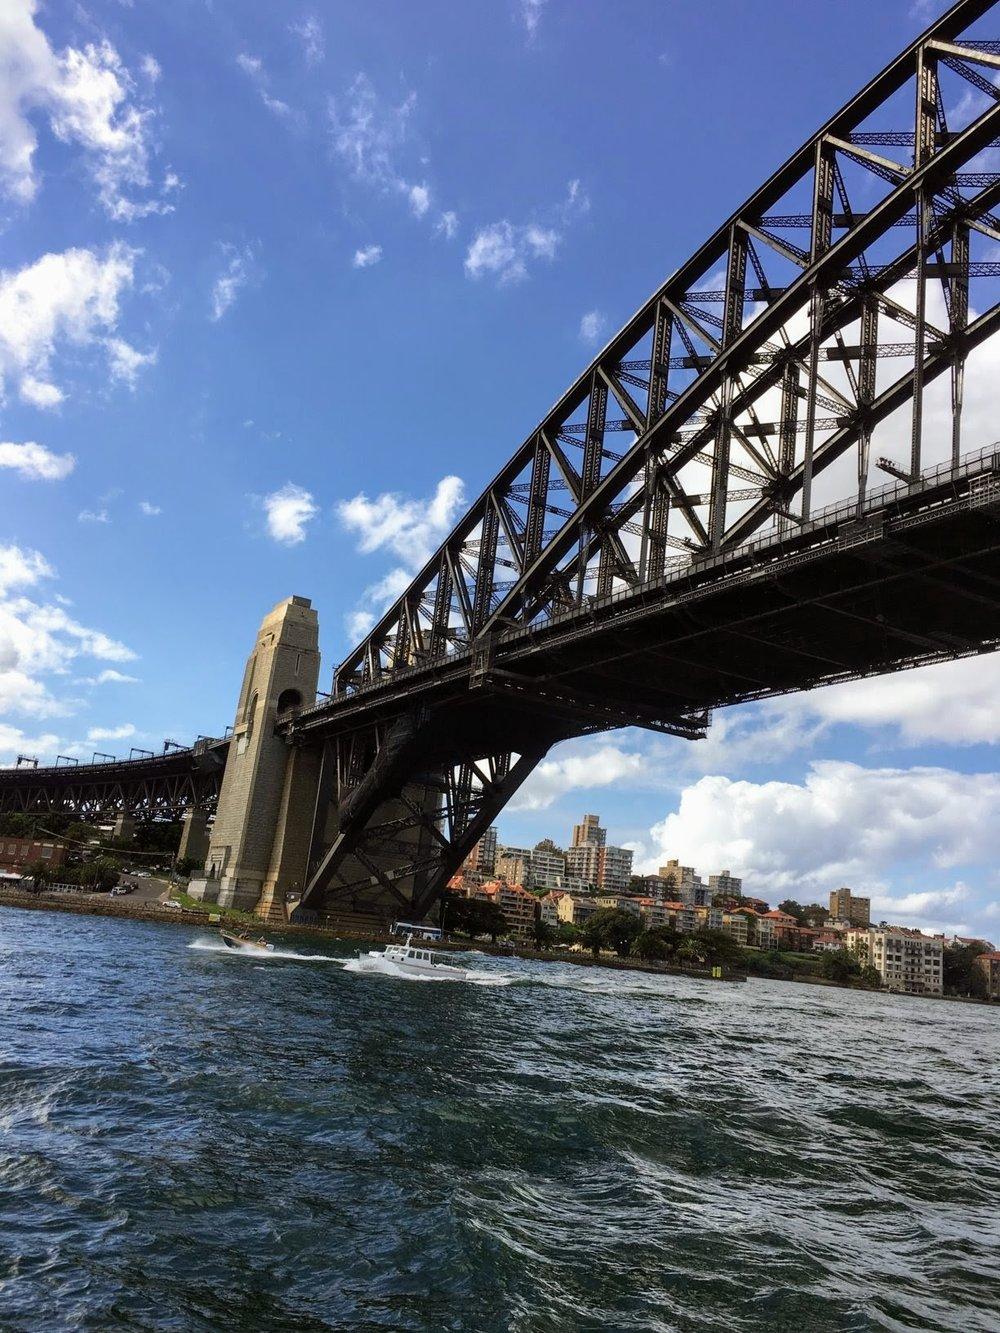 Sydney Bridge and Harbour